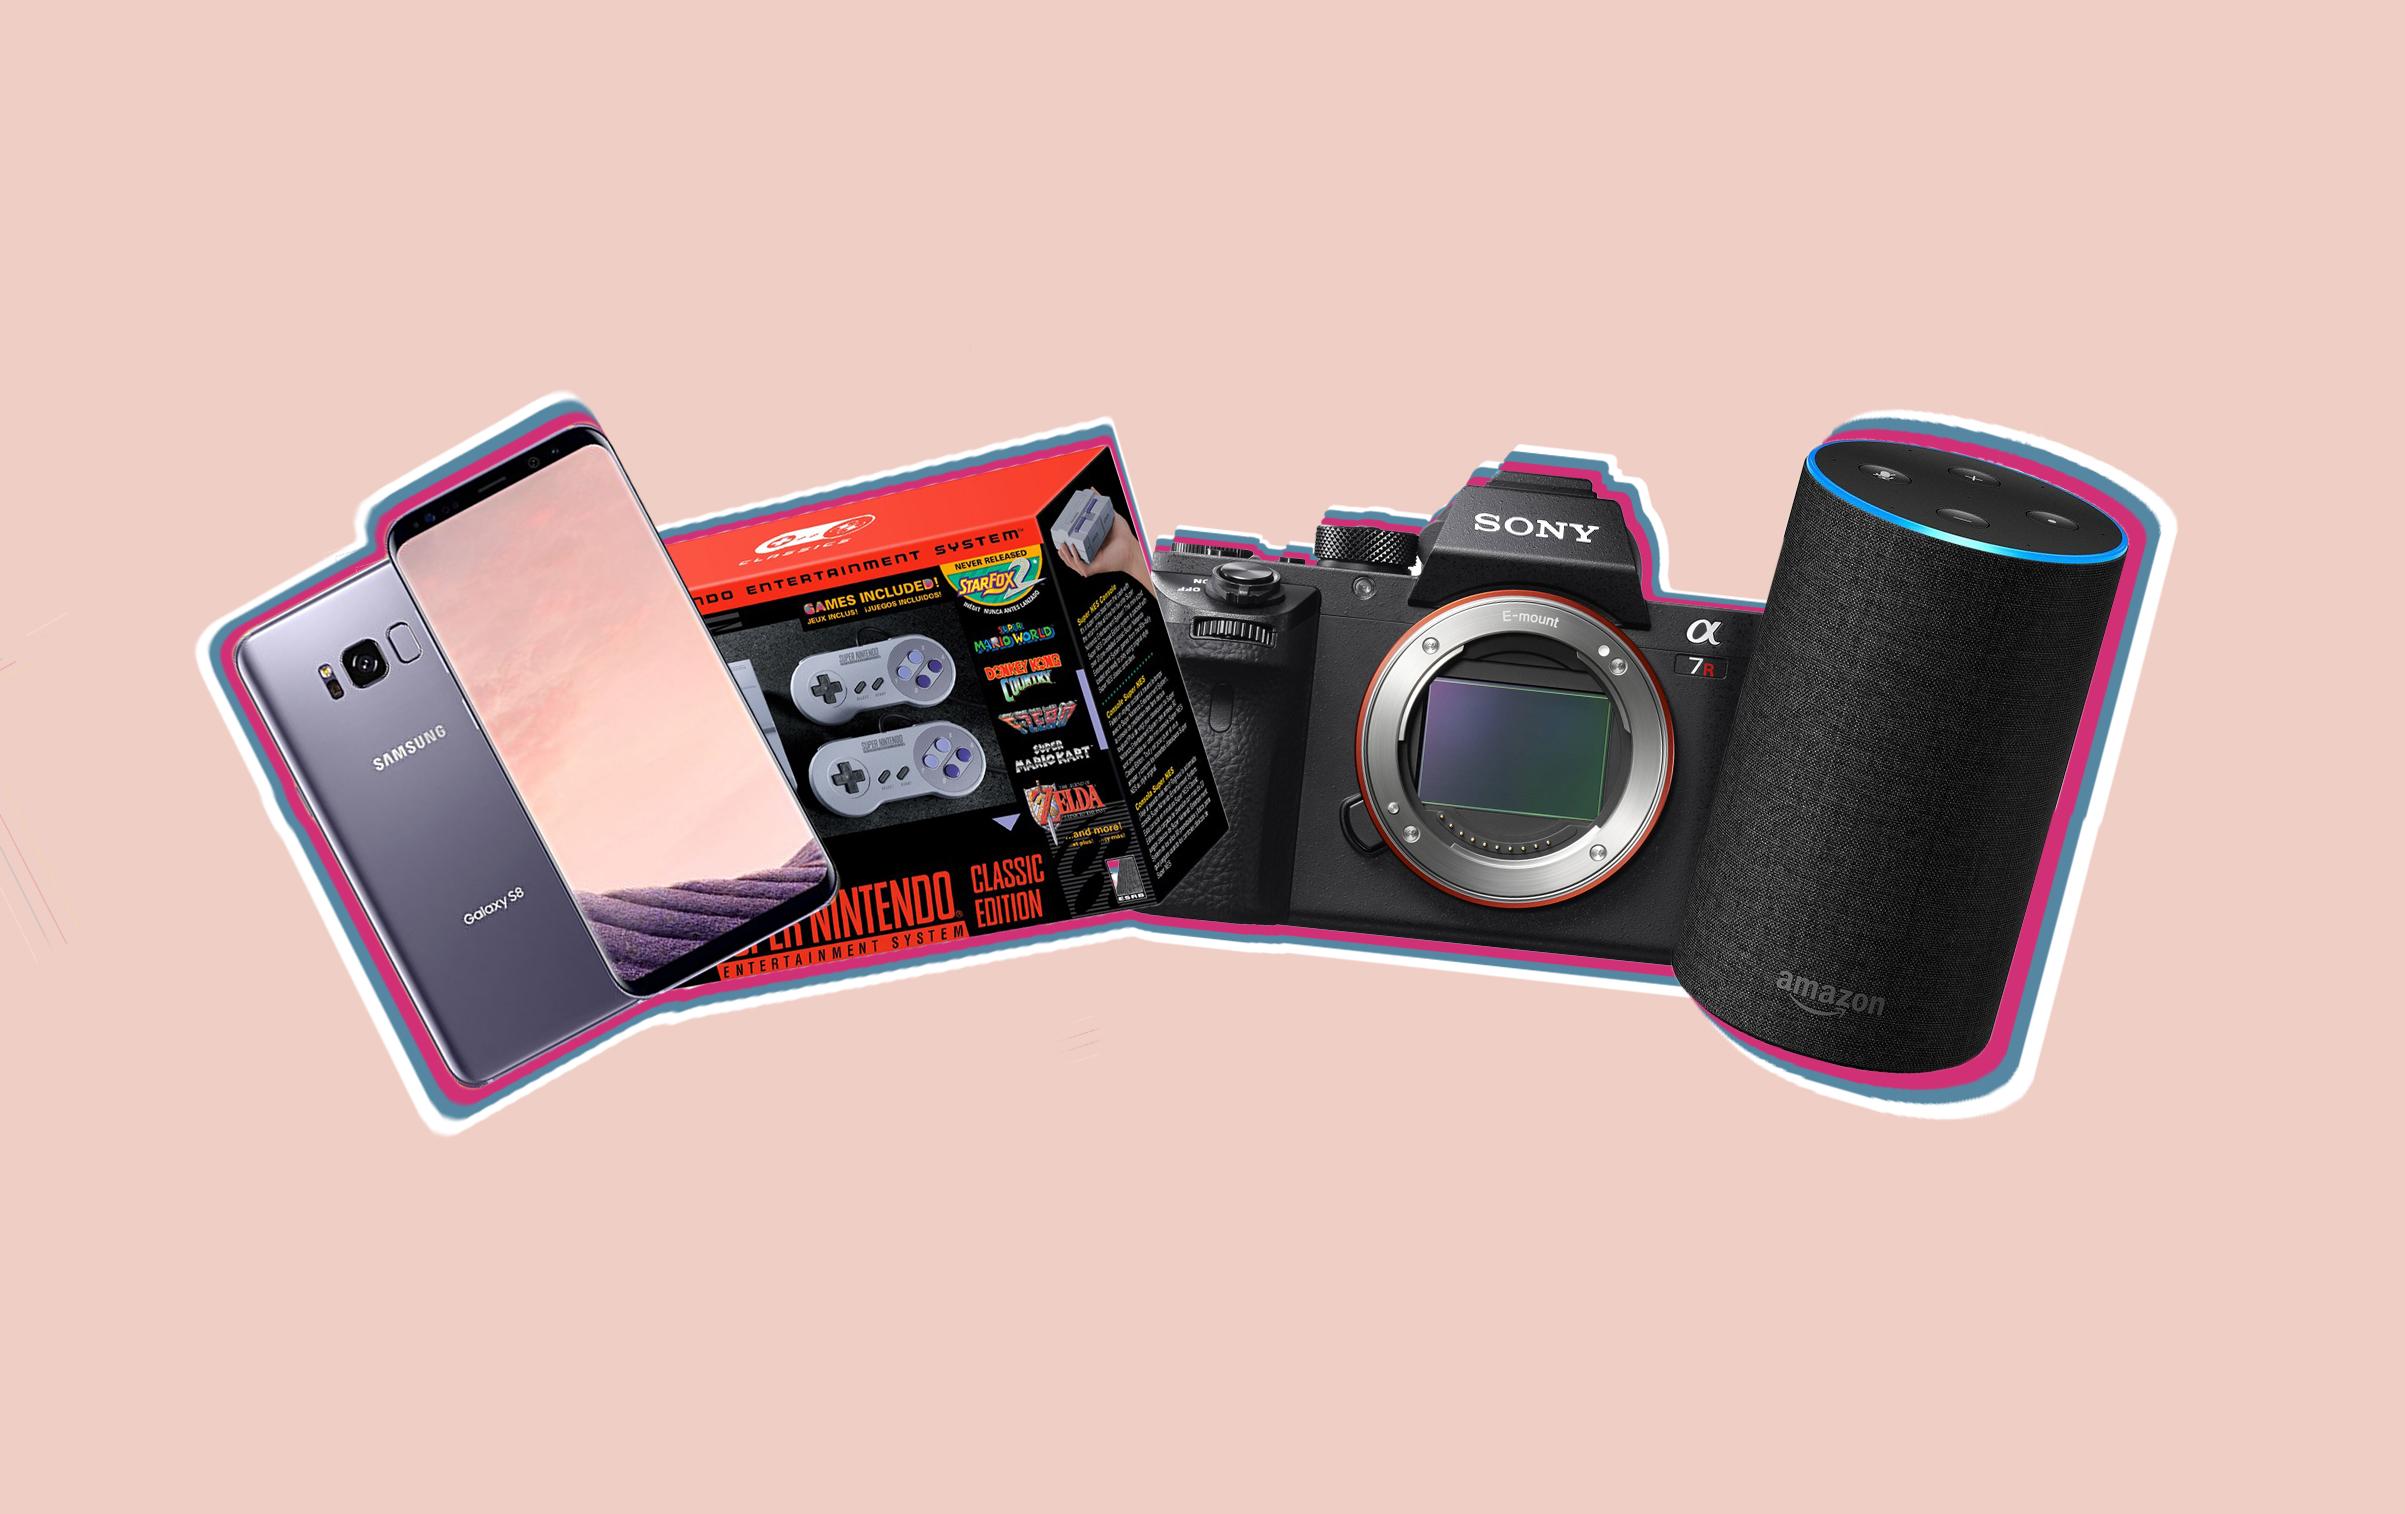 Versatile Camera Trigger - Capturing Lightning Photos With Ease